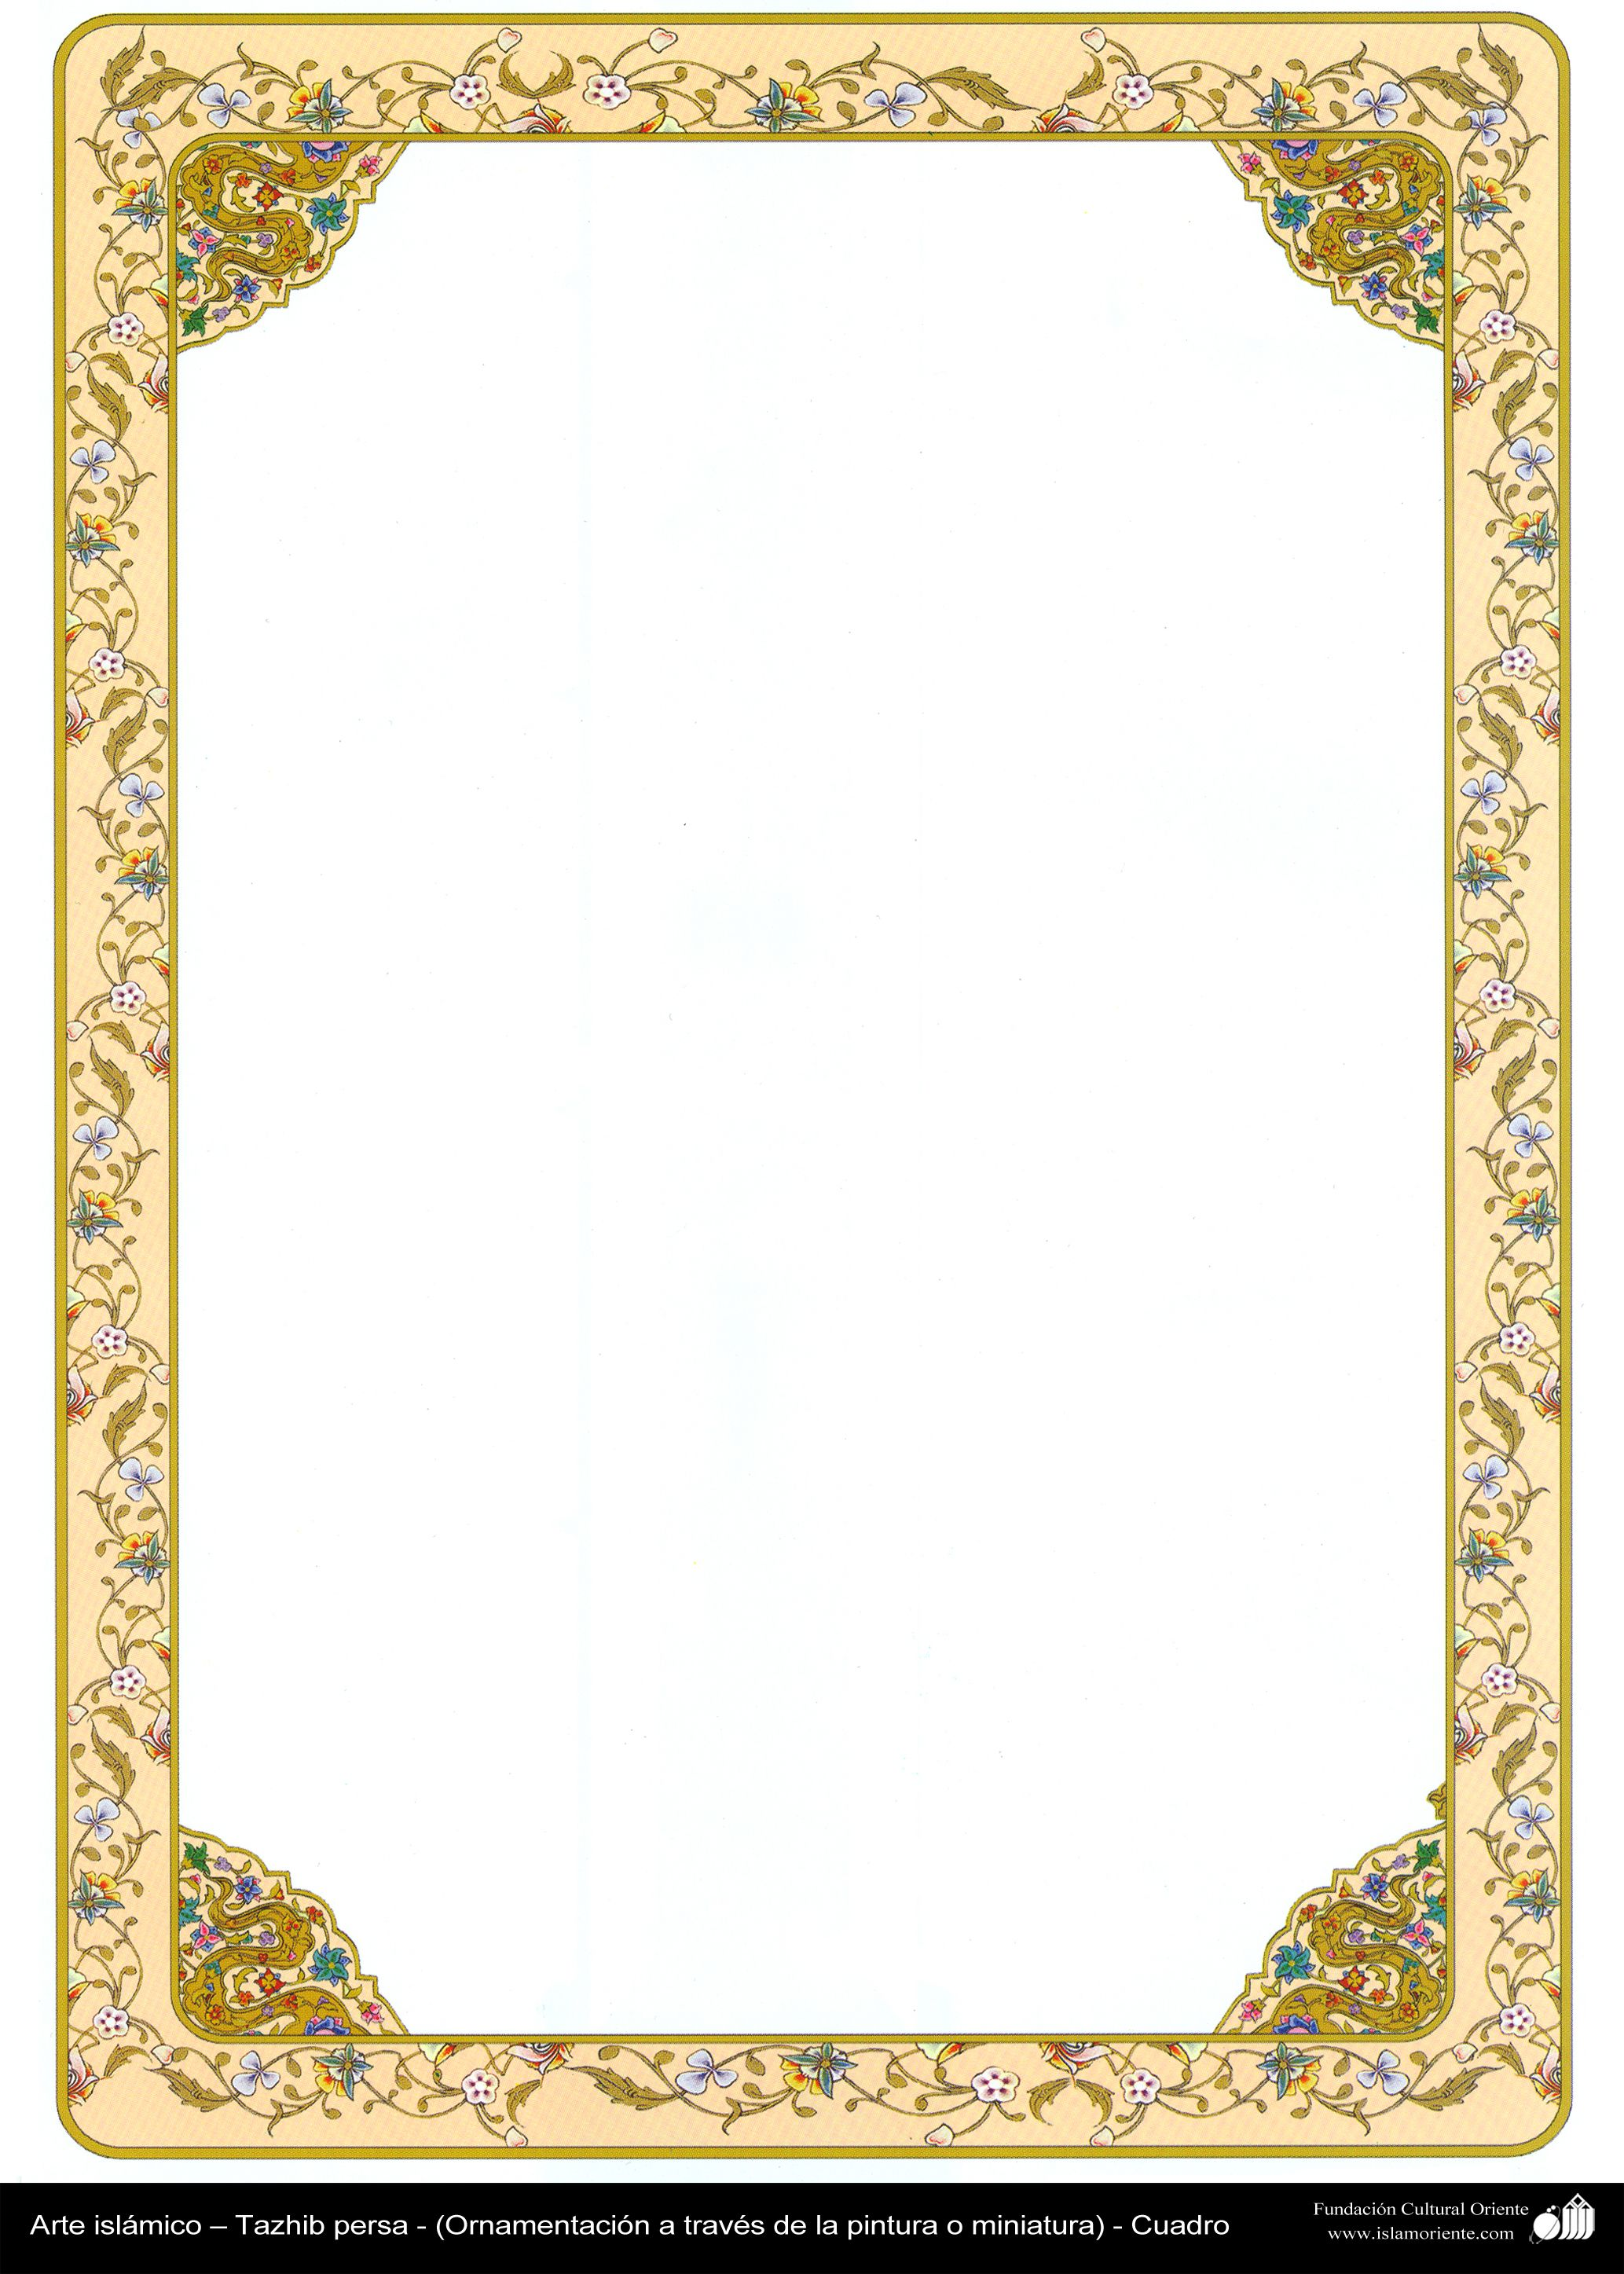 Islamic Art - Persian Tazhib - frame - 25 | Узоры, Орнаменты, Буквы ...